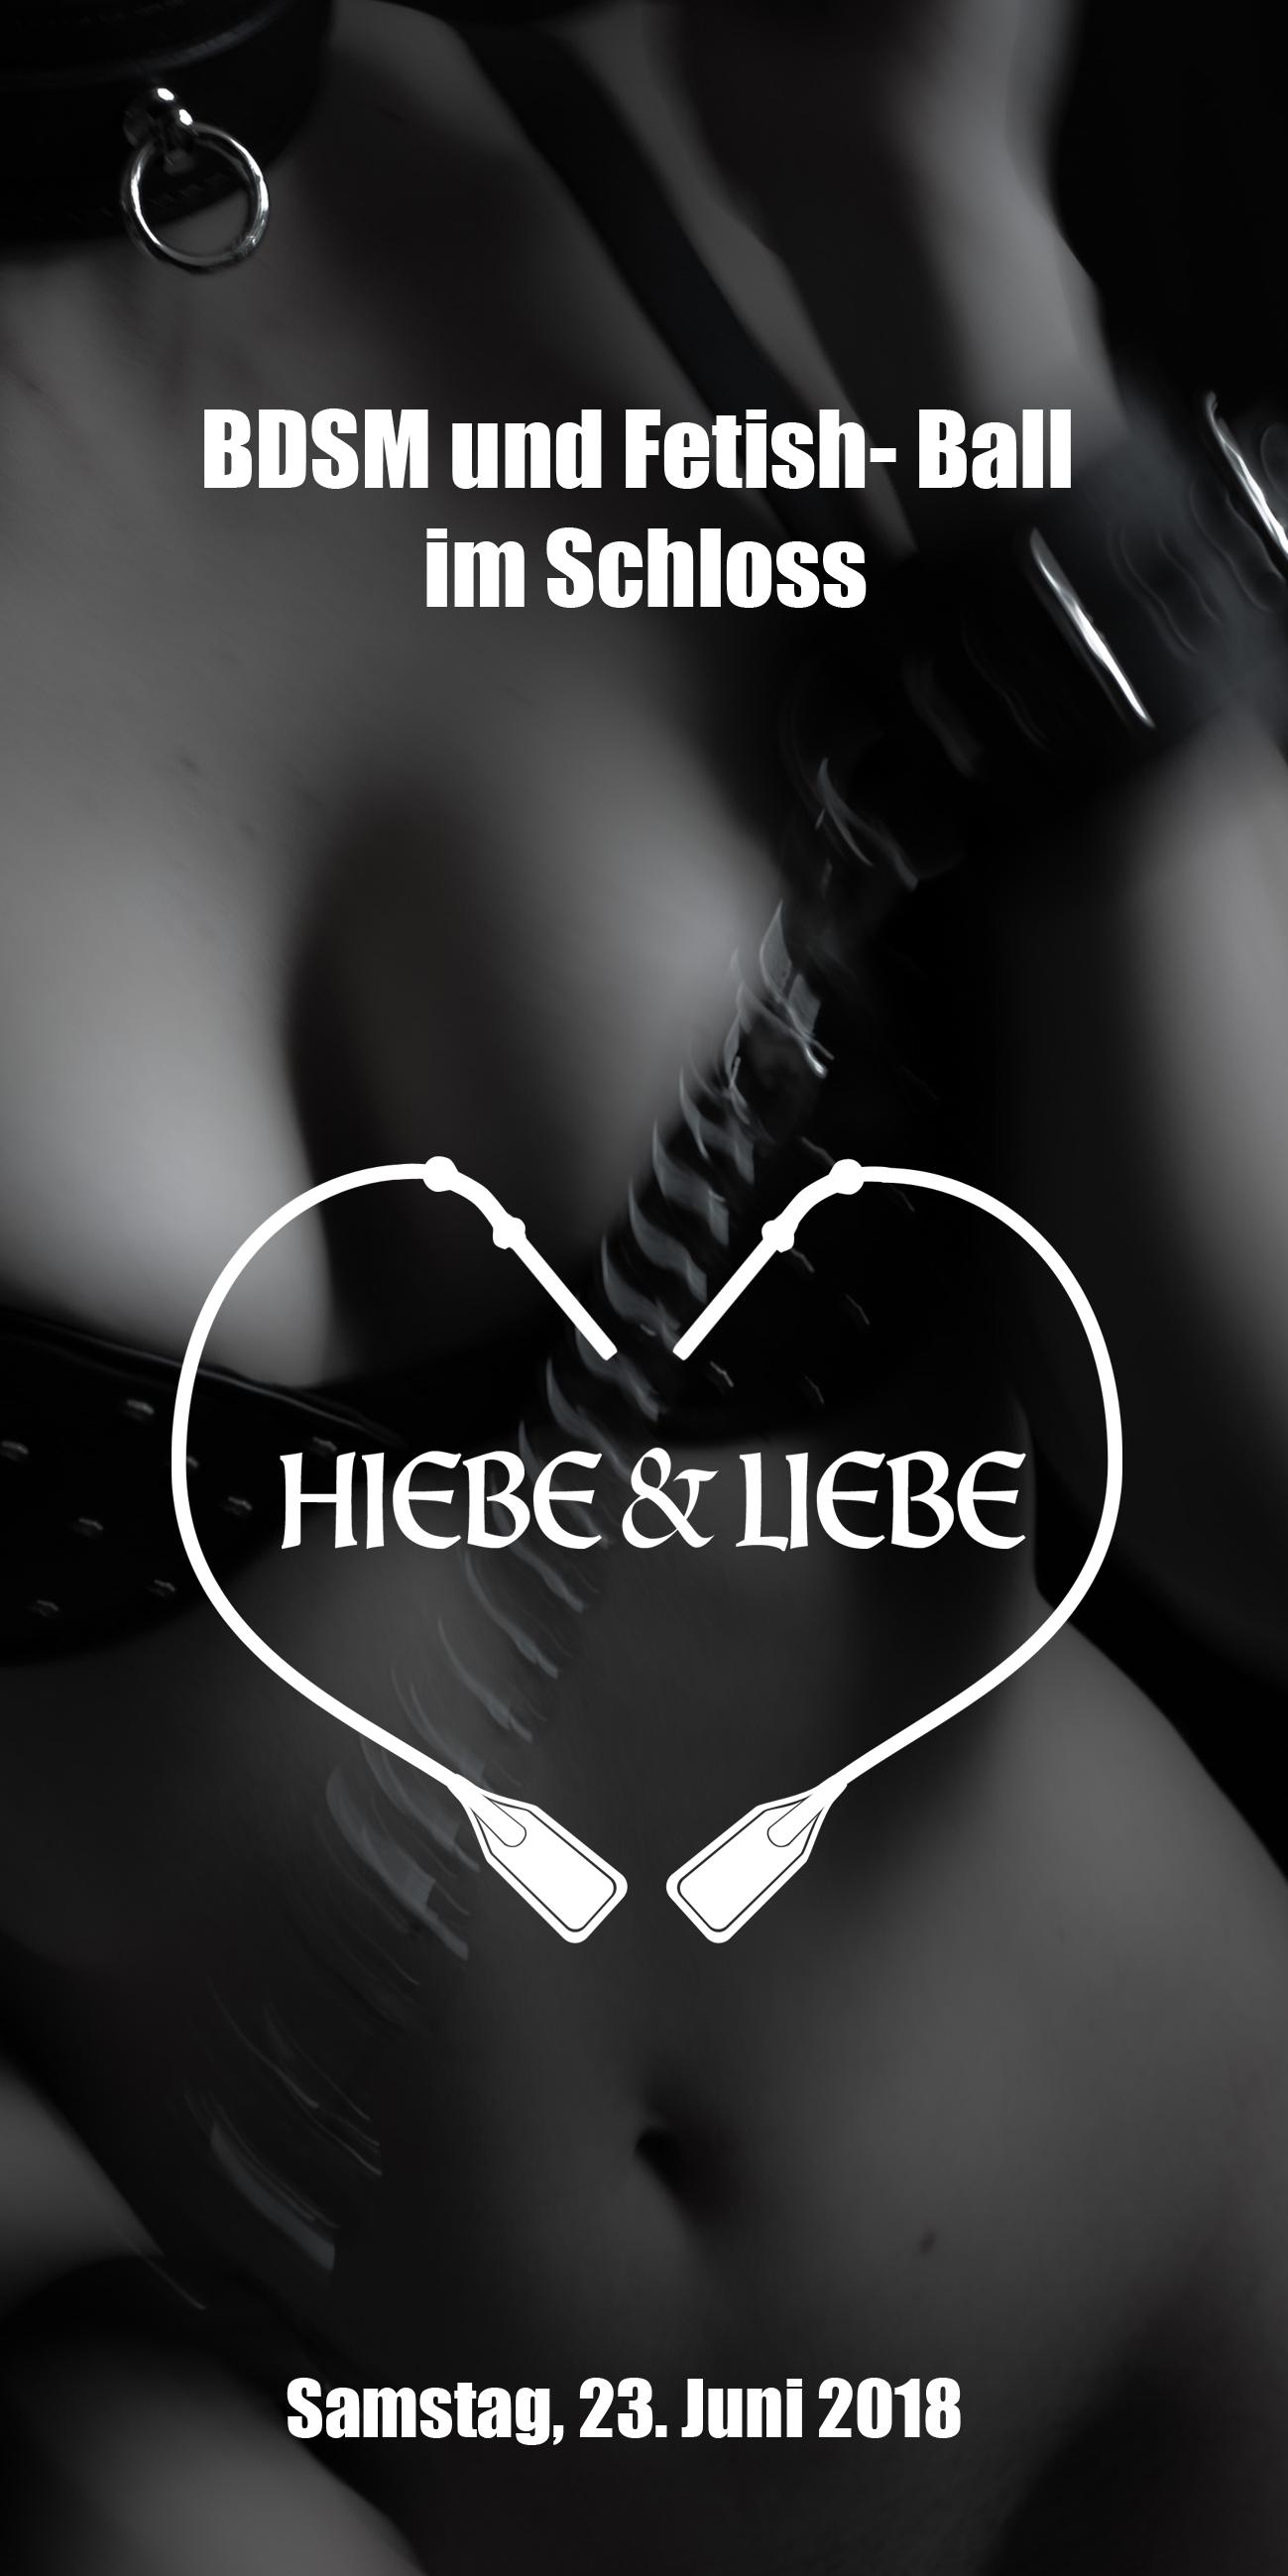 Berlin erotik anzeige